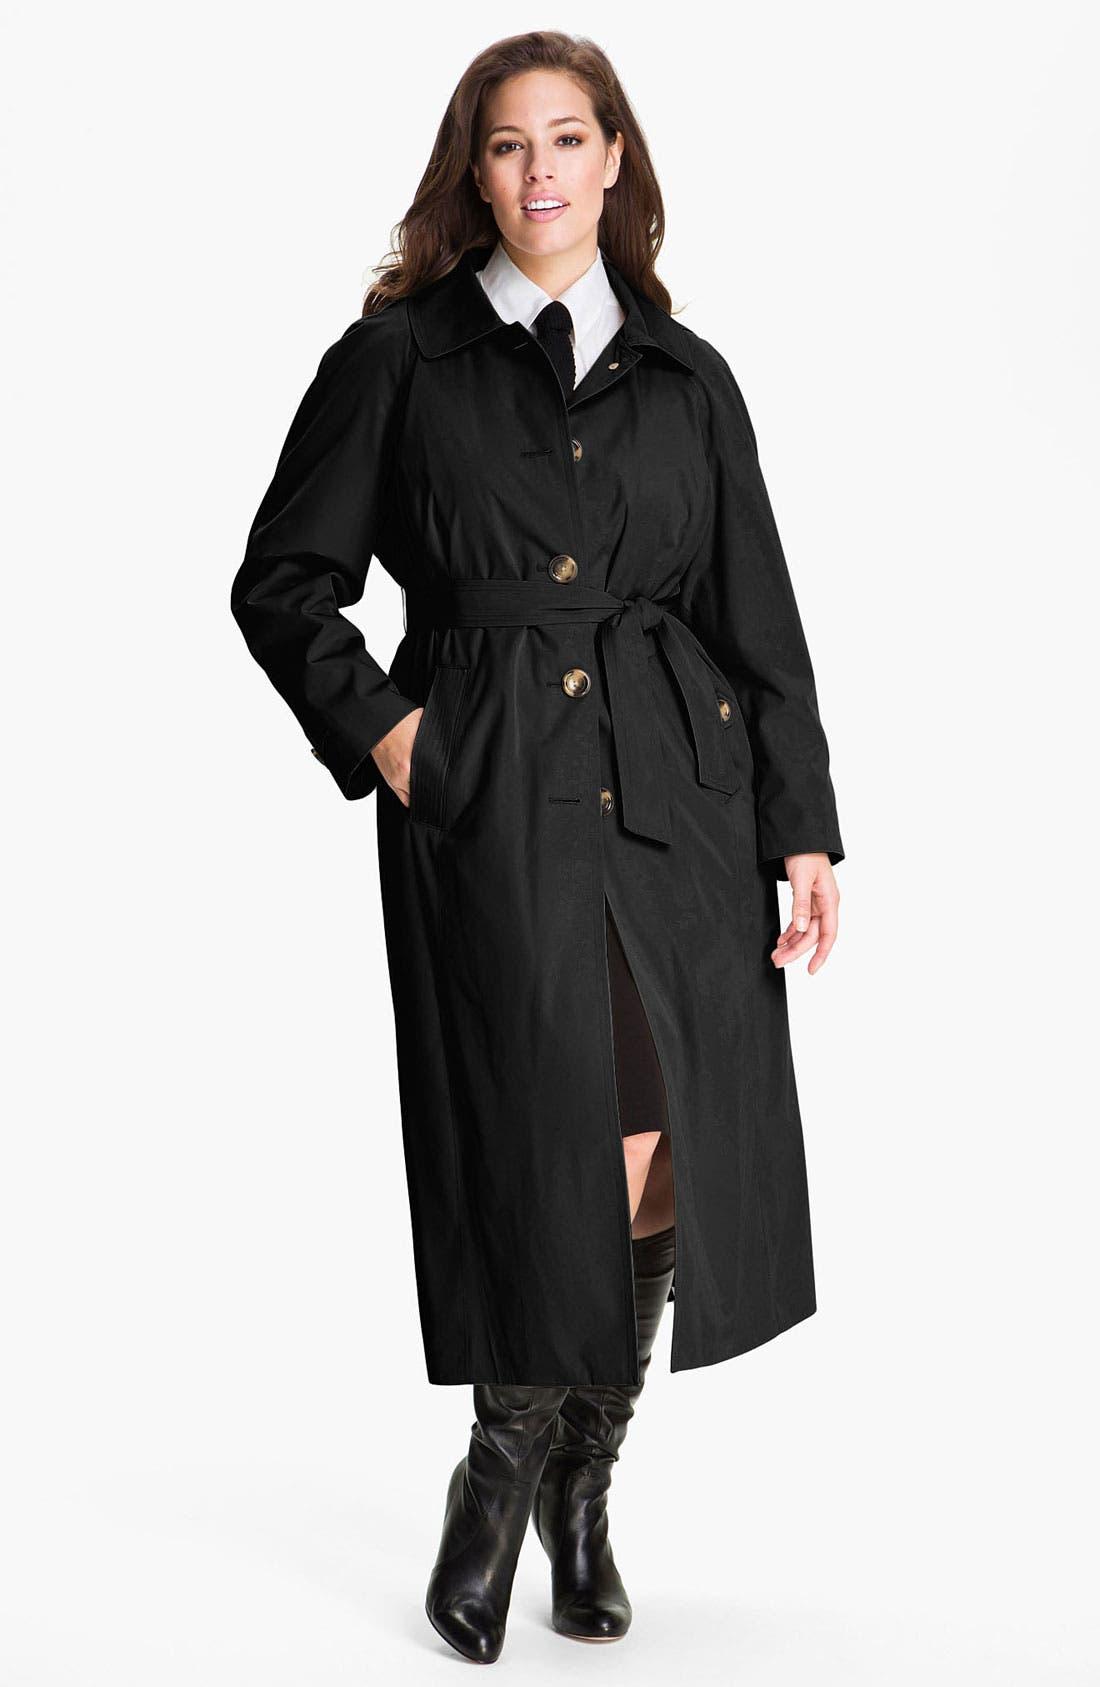 Alternate Image 1 Selected - London Fog Raglan Sleeve Raincoat with Detachable Liner (Plus) (Online Exclusive)